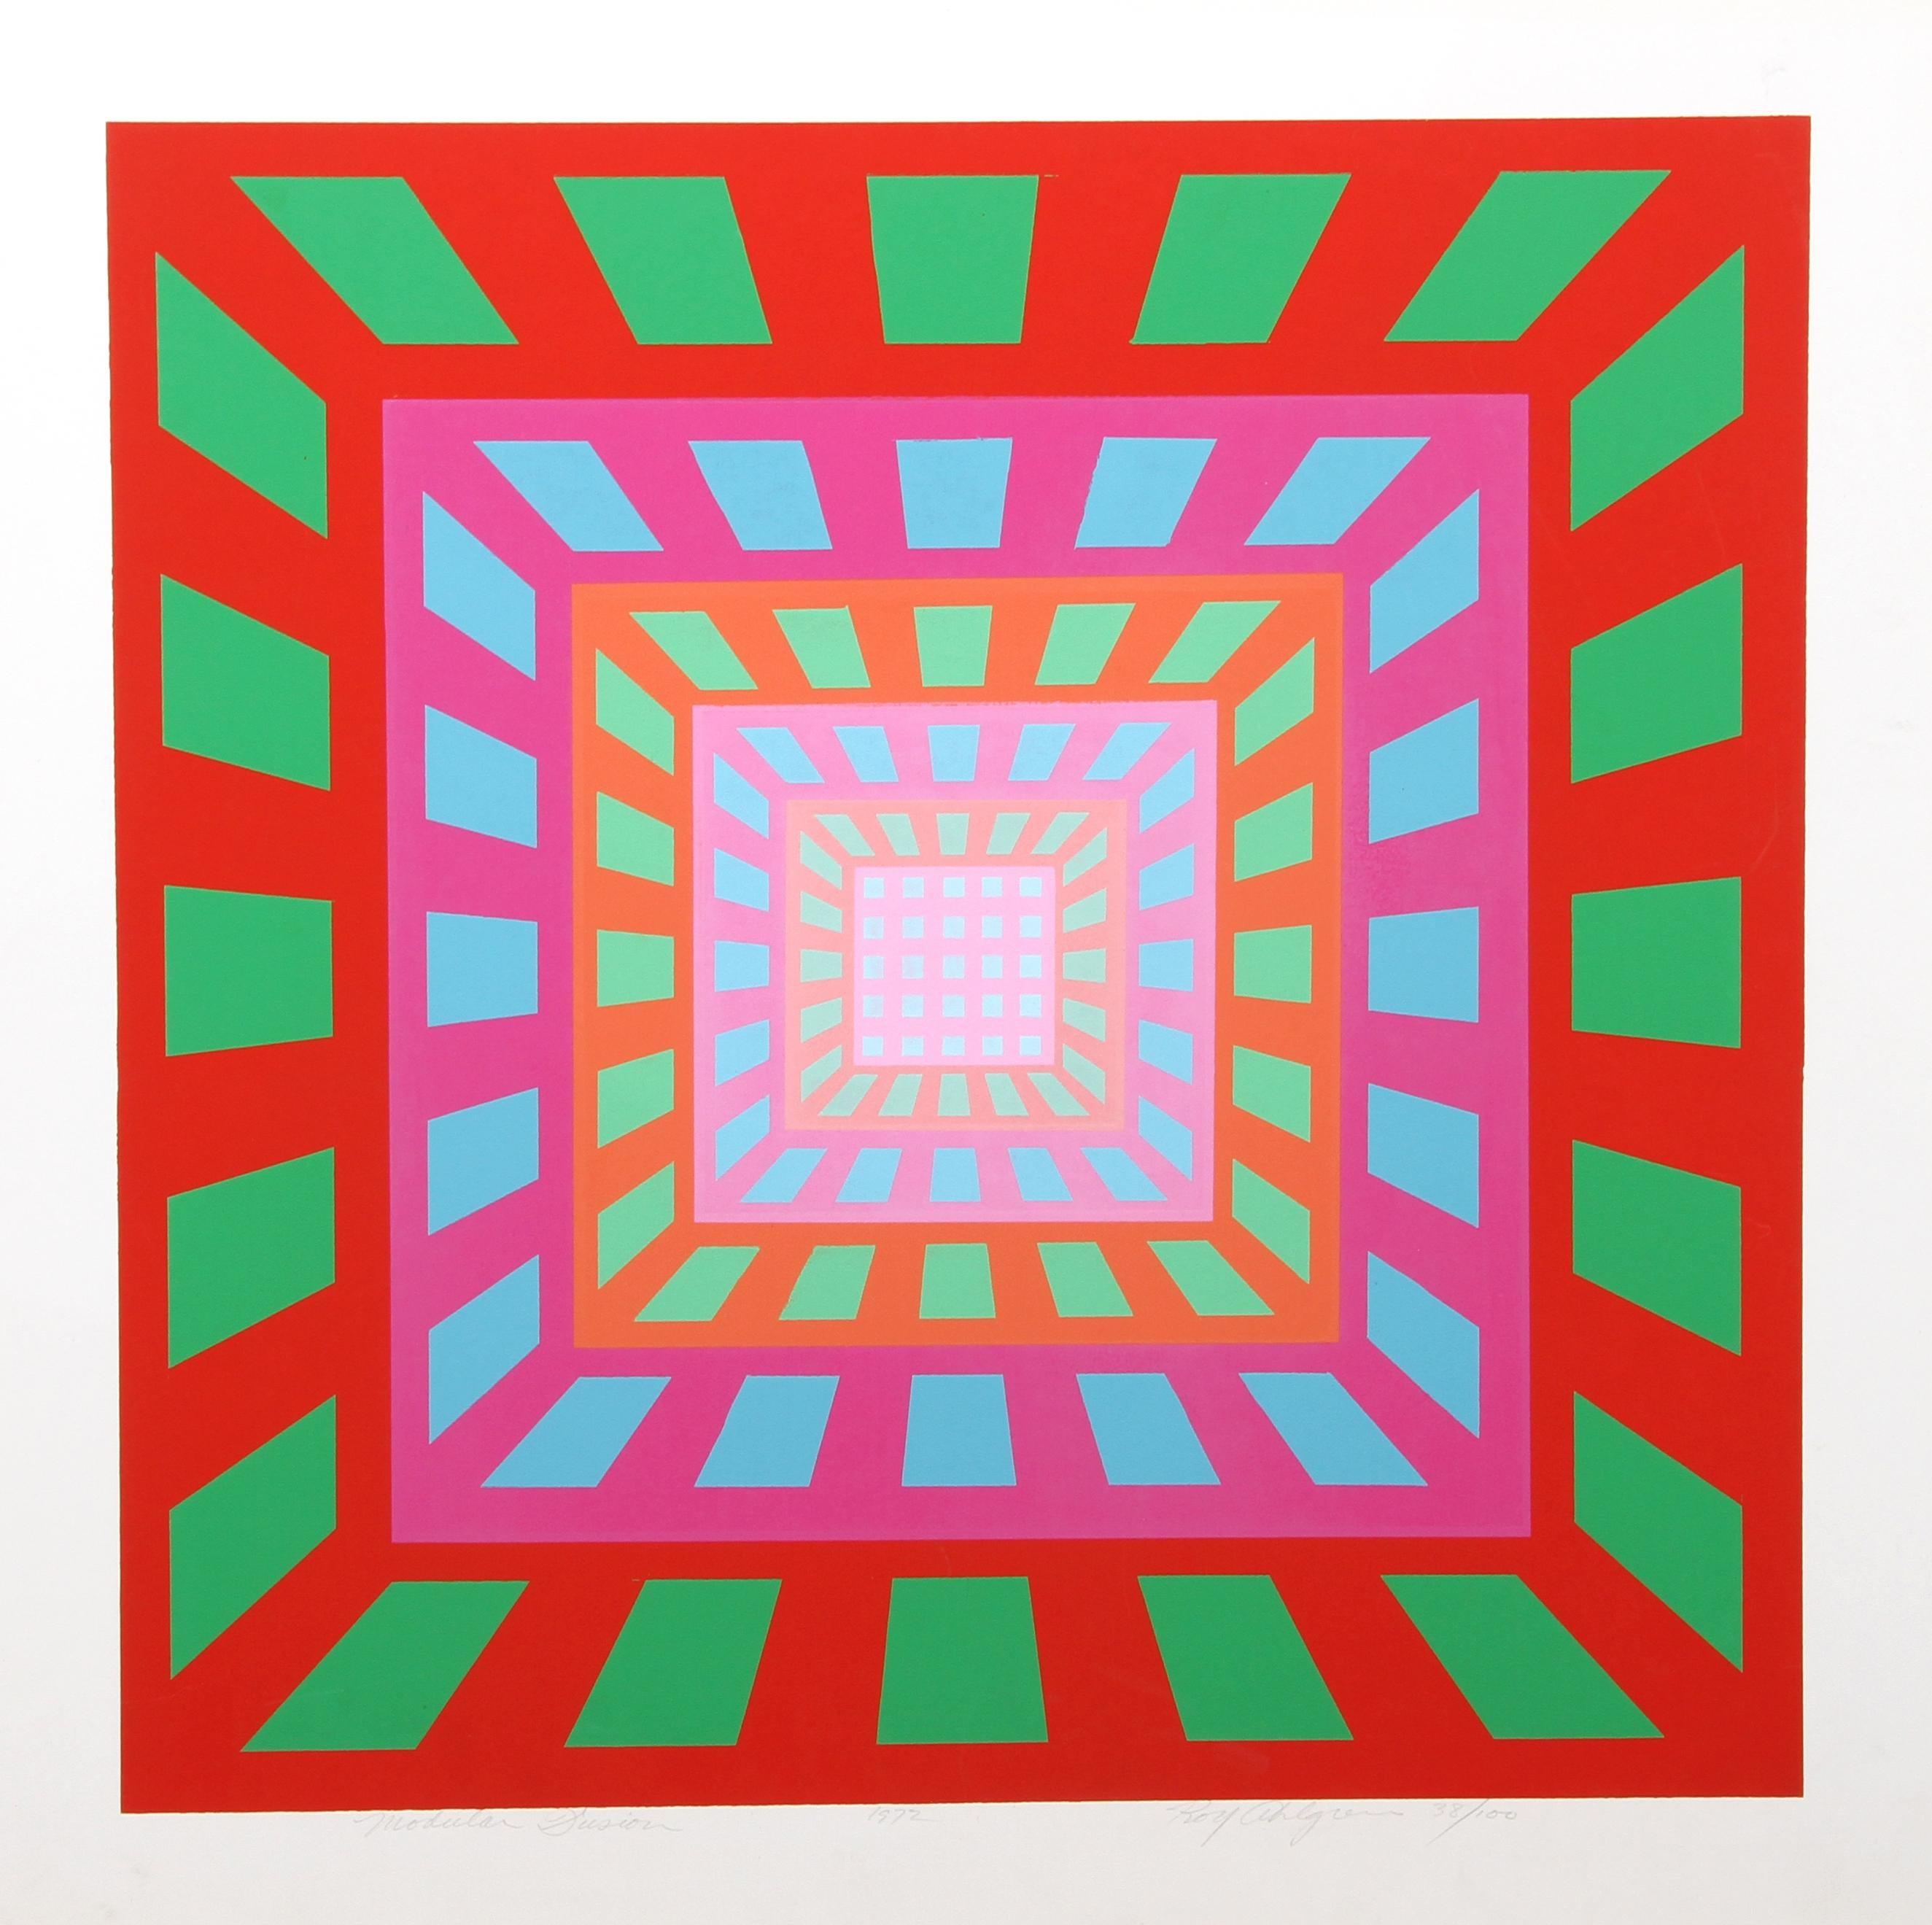 """Modular Fusion"", 1972, Silkscreen by Roy Ahlgren"